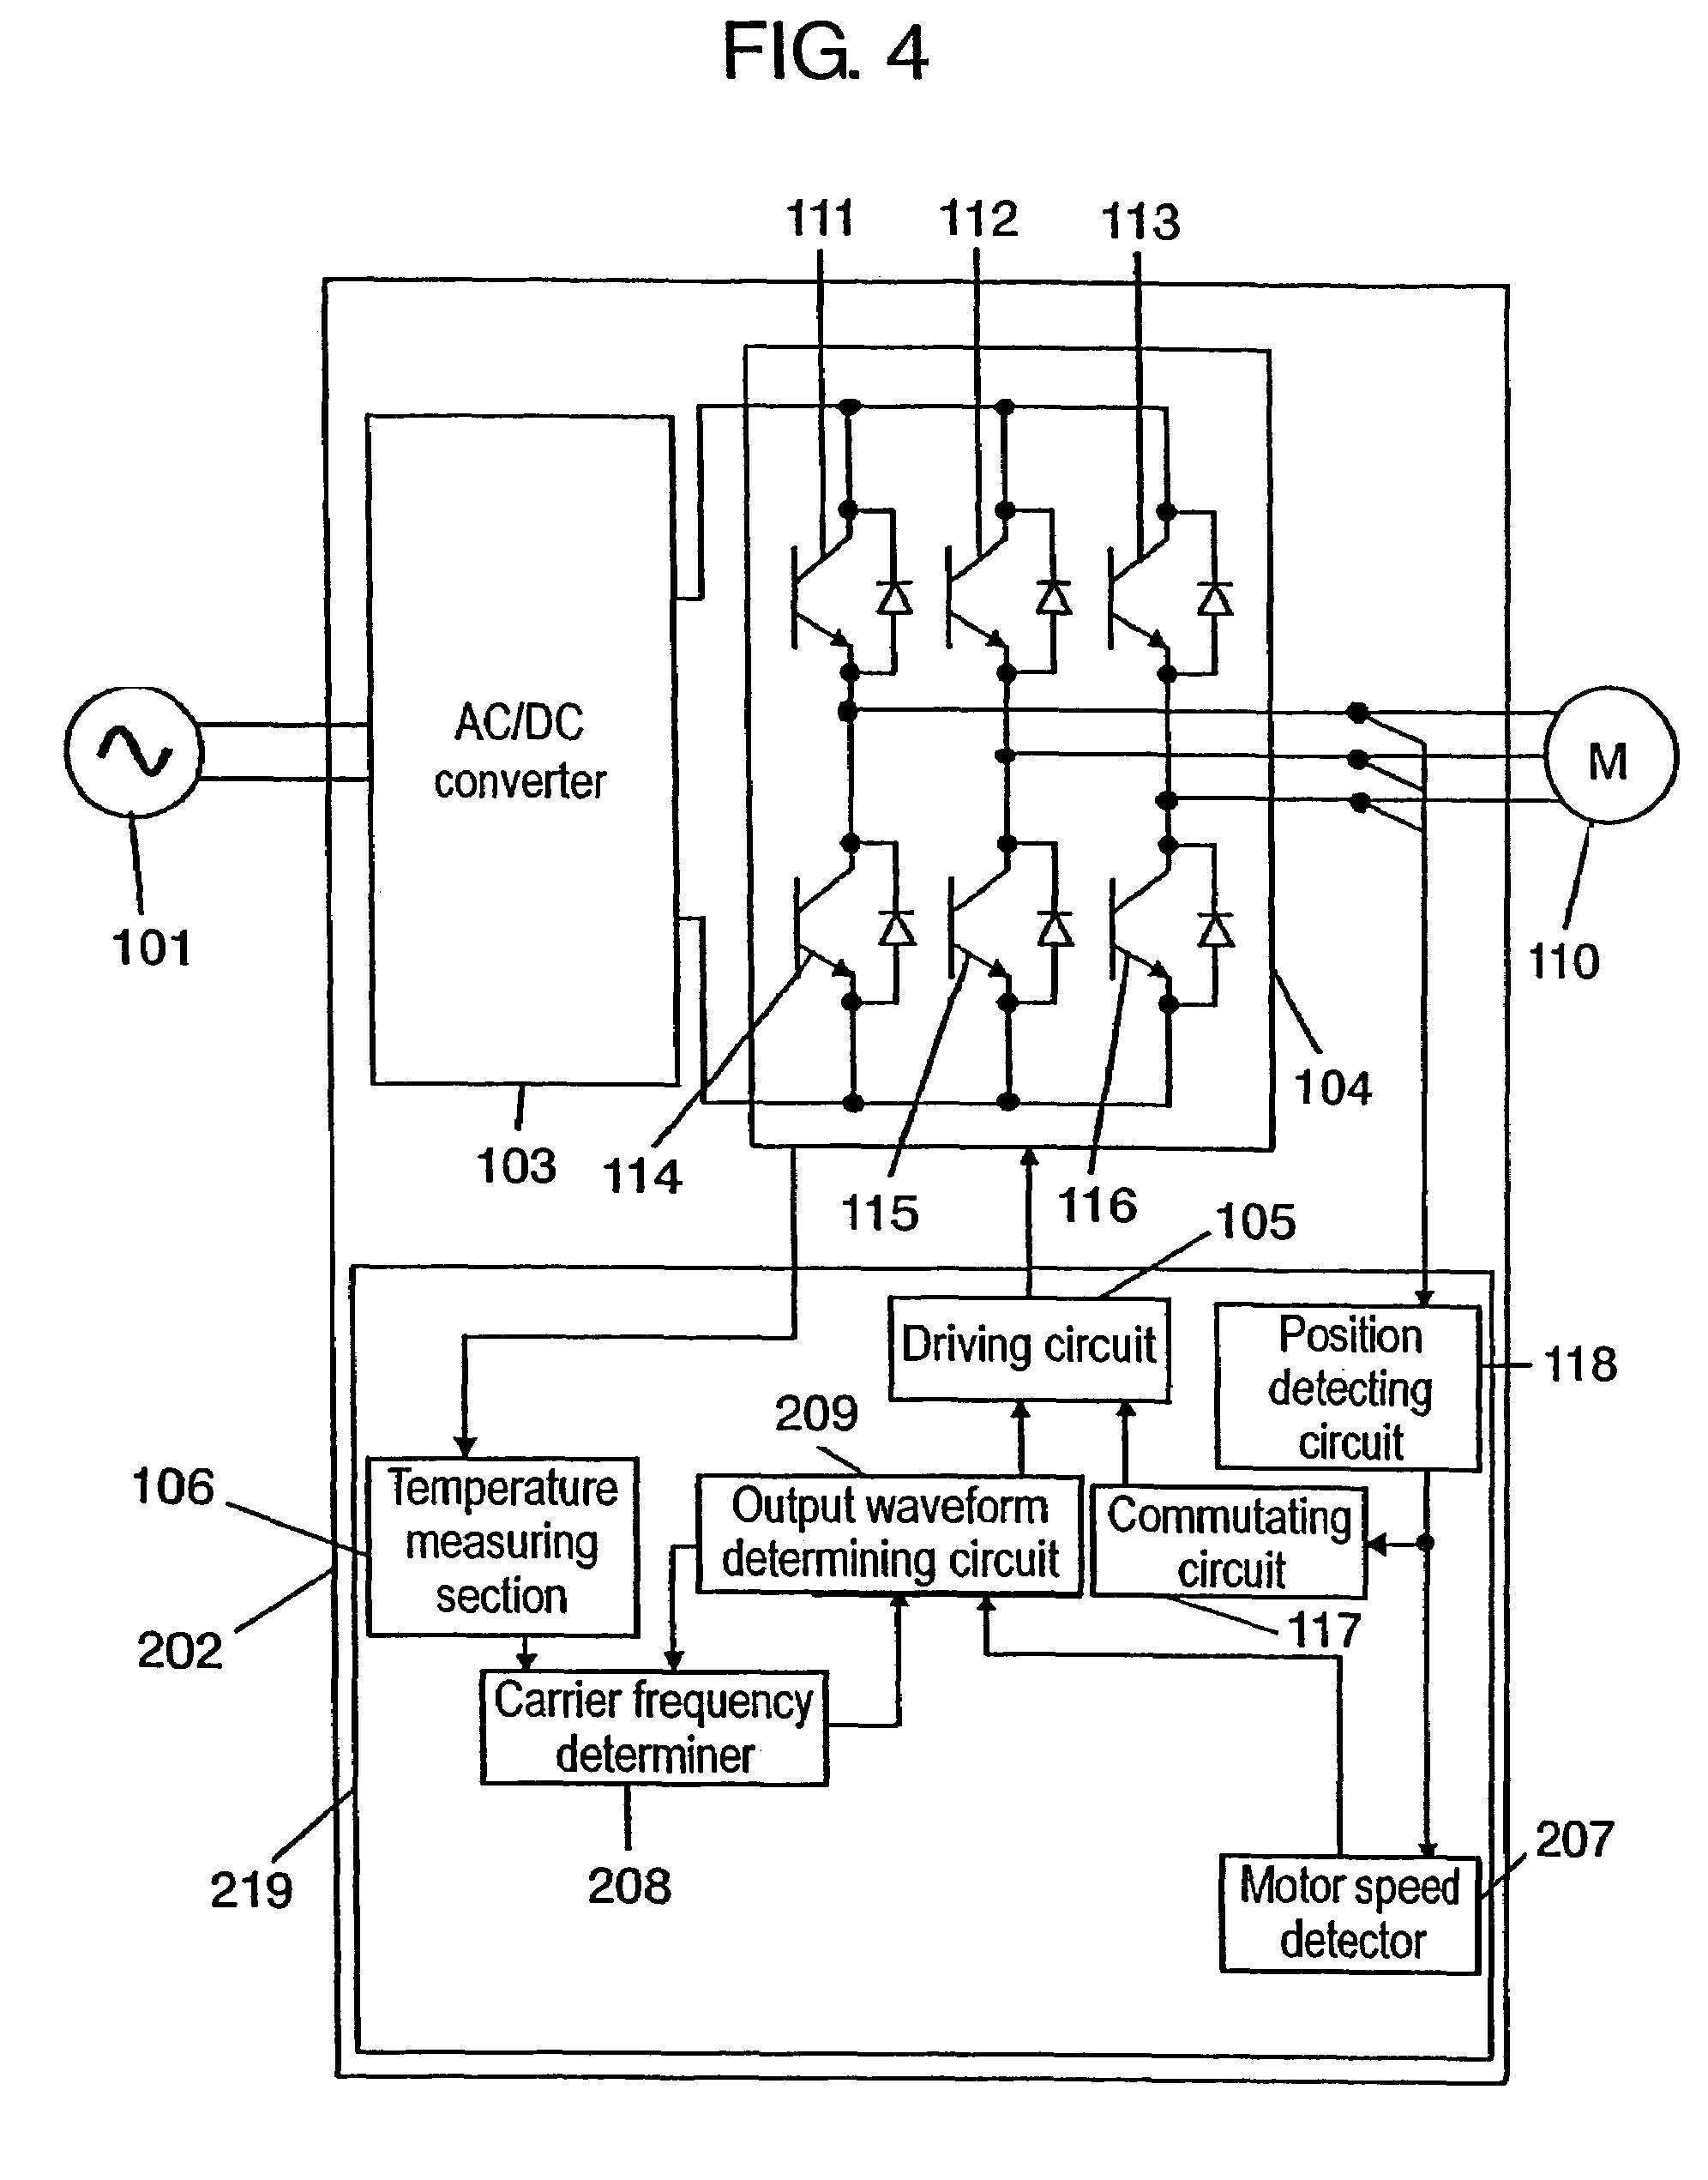 Patent us5262704 protection circuit in john deere 825i wiring diagram circuit diagram of inverter refrigerator circuit and schematics us07400109 20080715 d00003 circuit diagram of inverter refrigerator asfbconference2016 Images